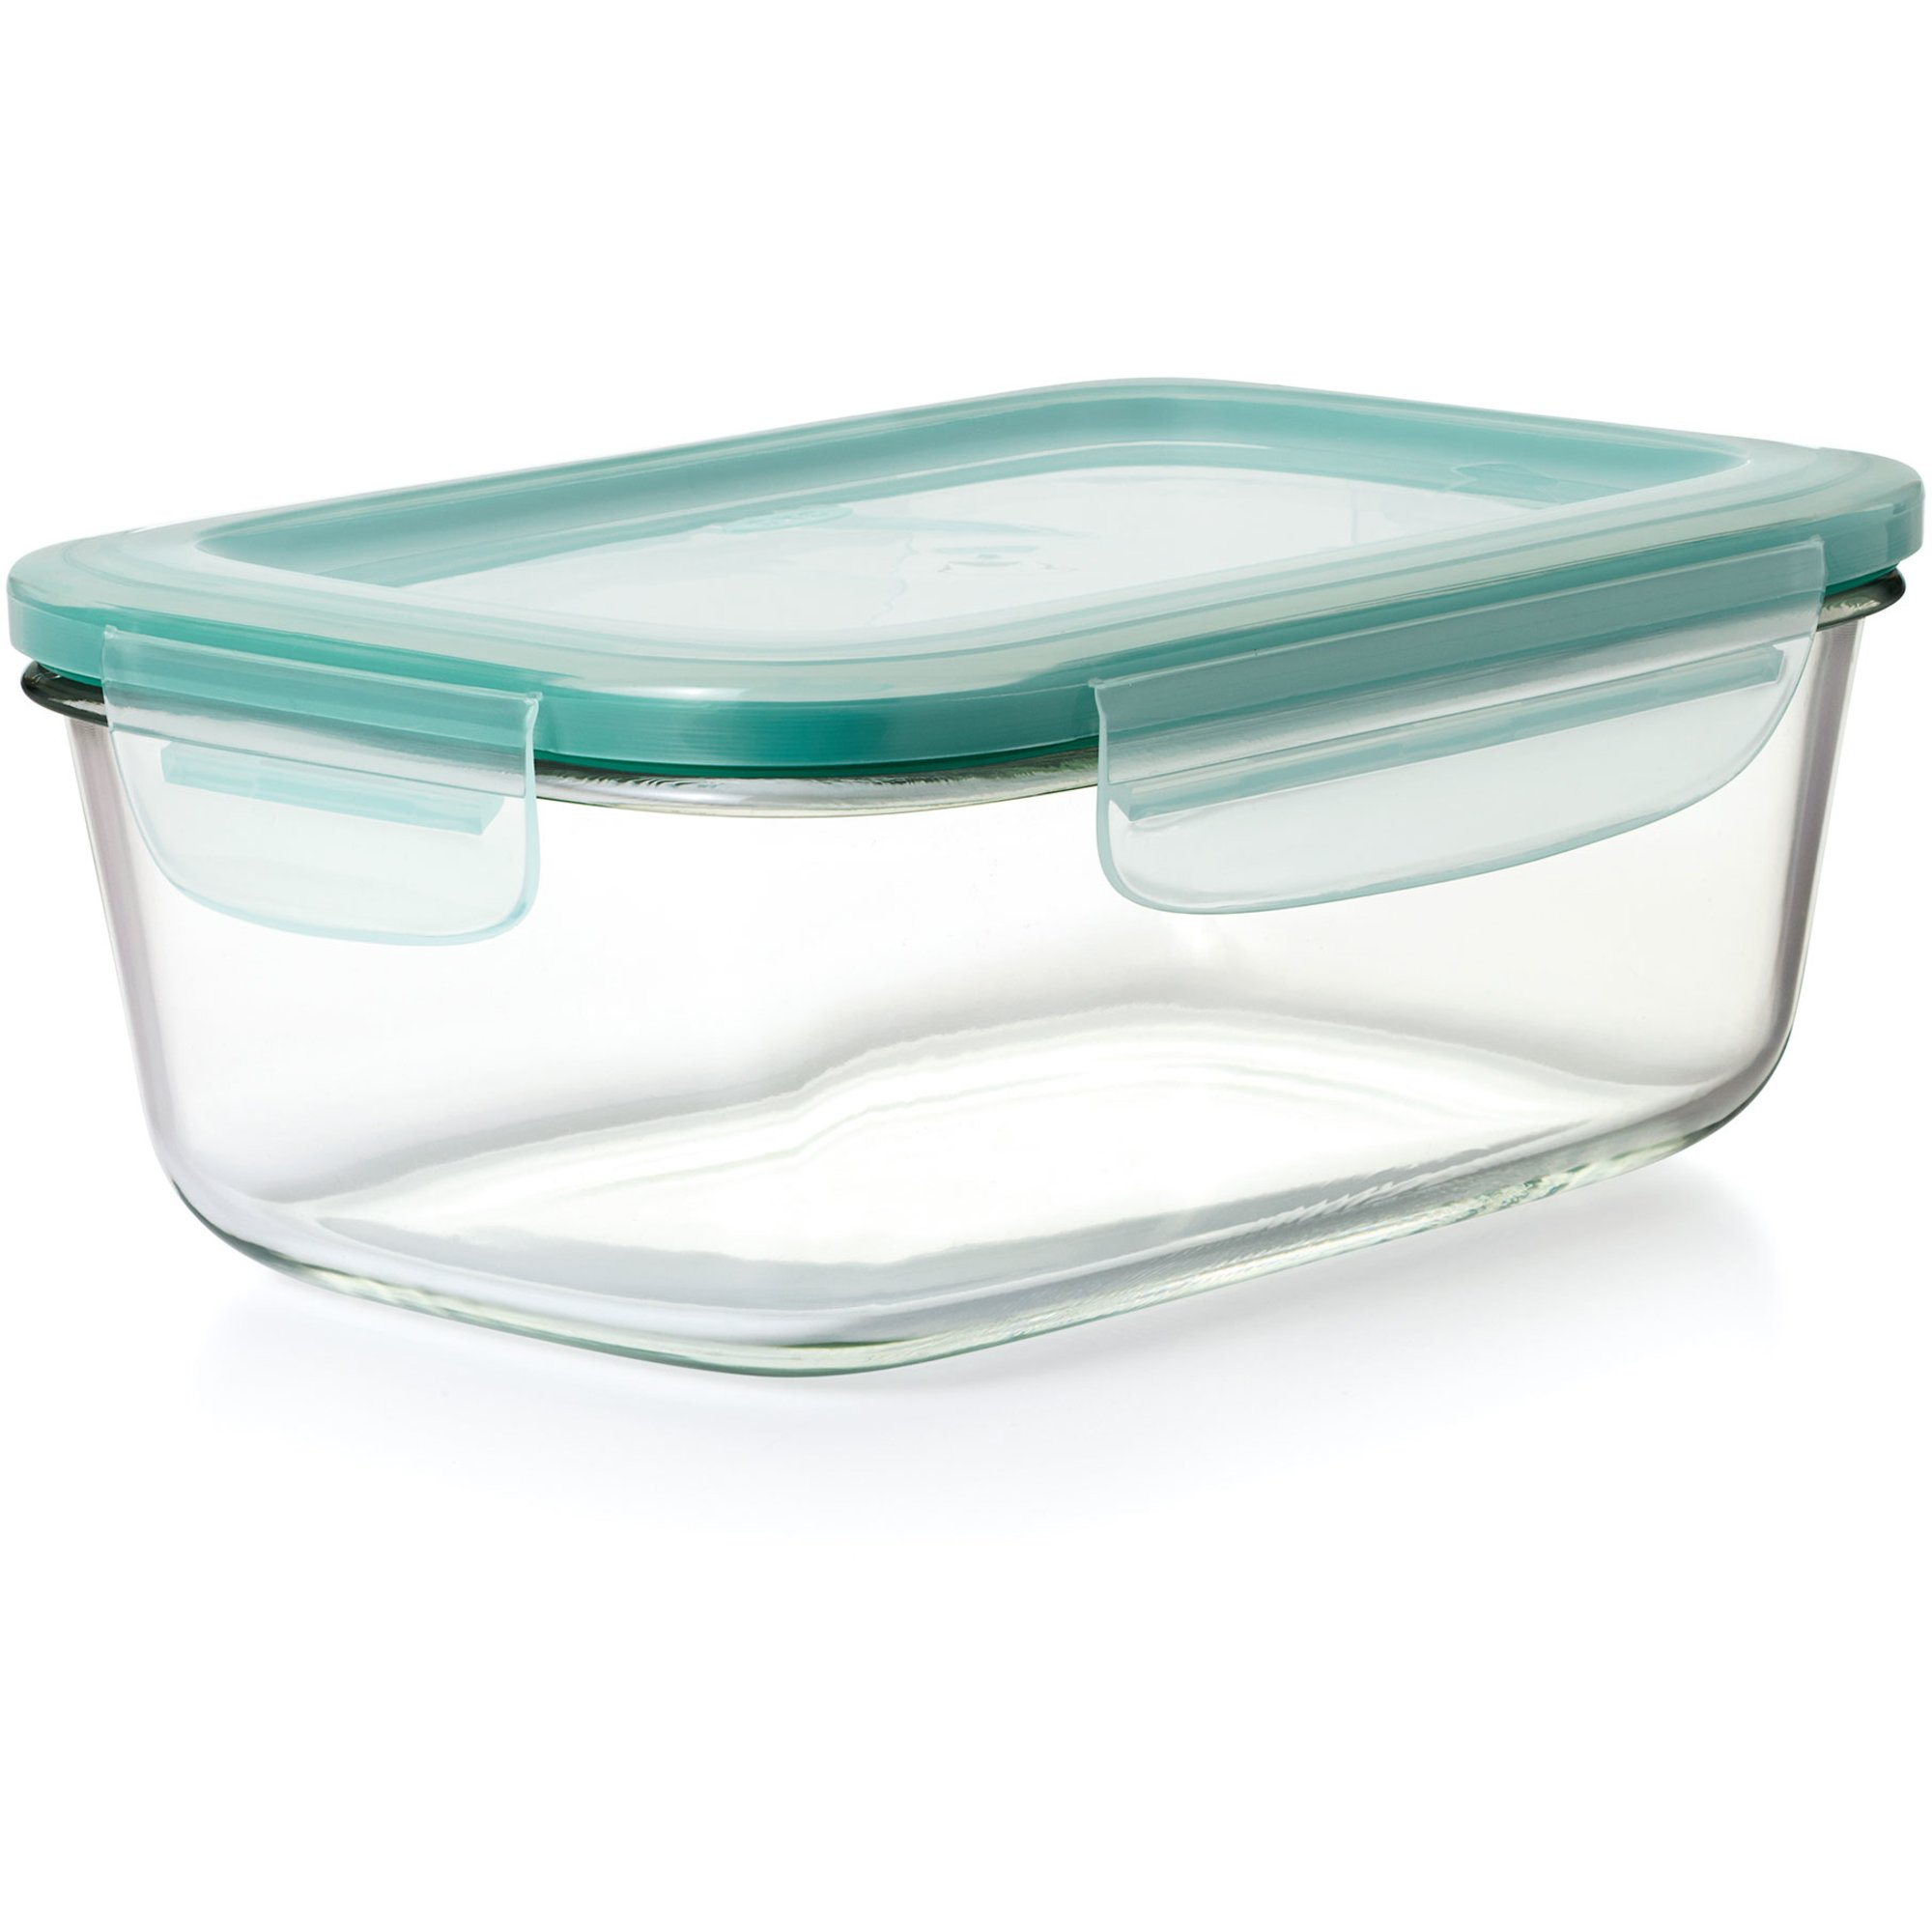 OXO Matlåda glas rektangulär 1900 ml